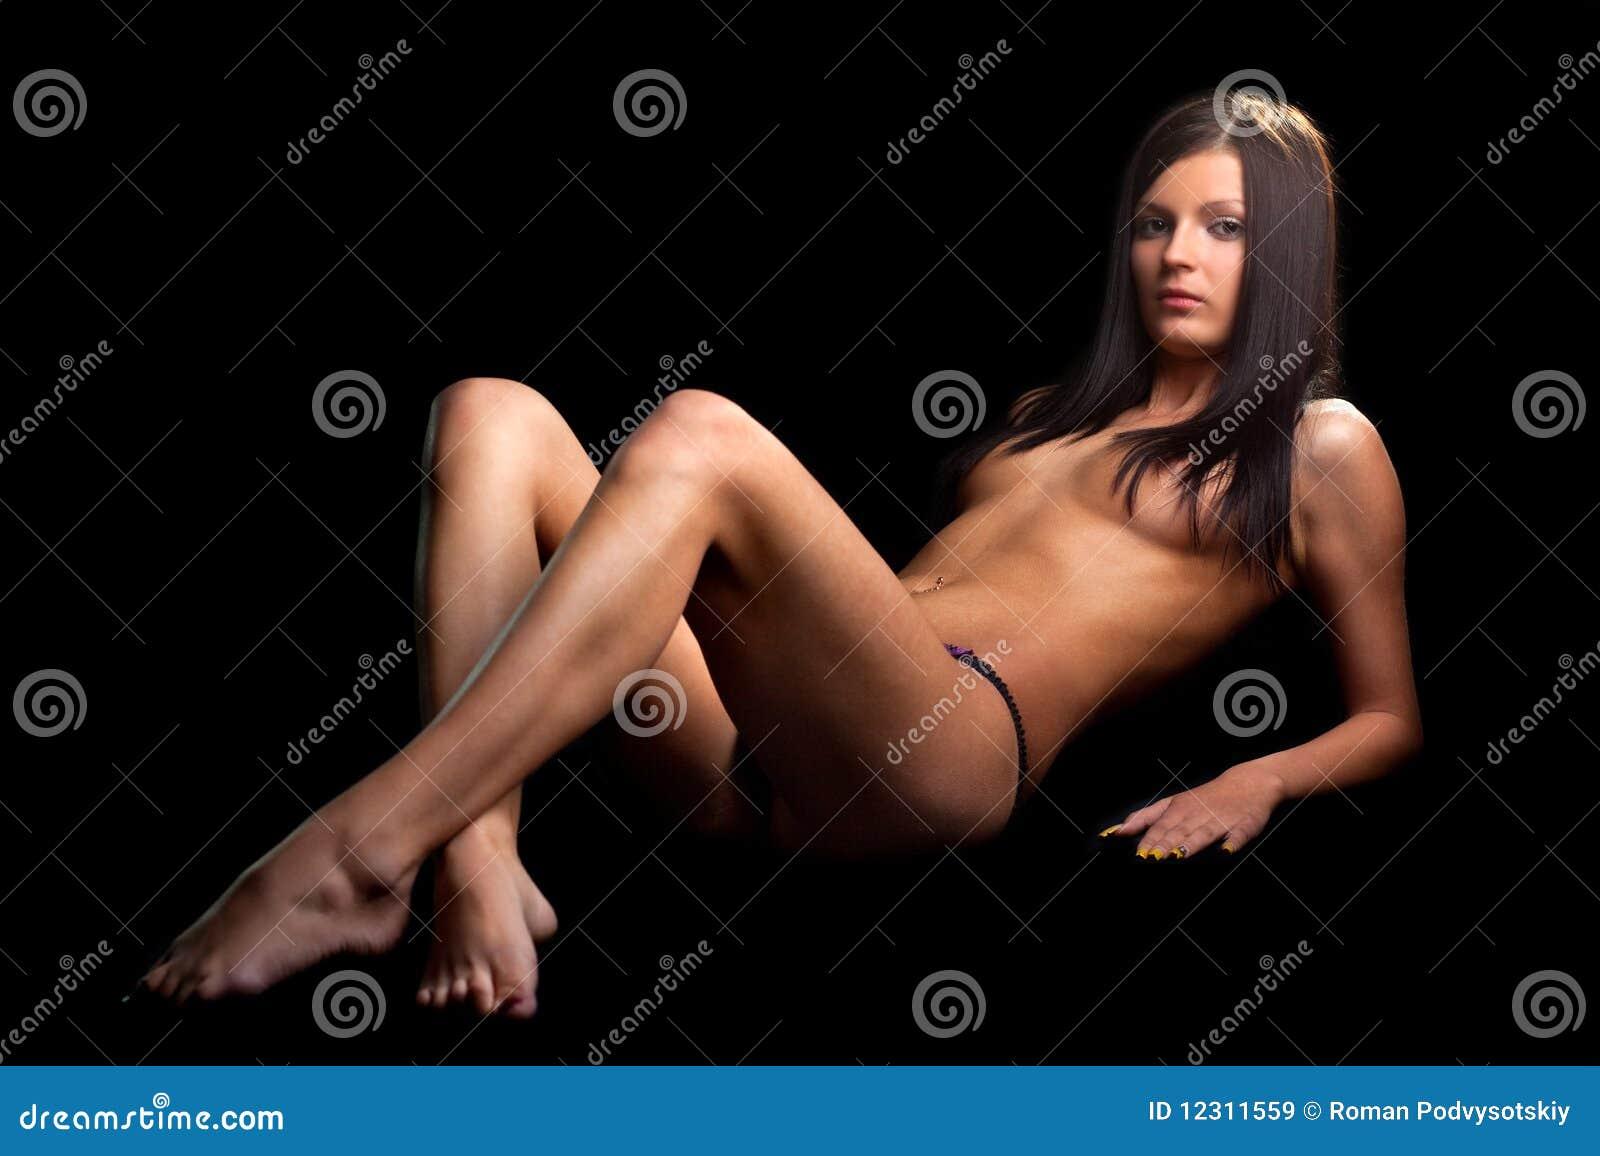 Perfect nude female bodybuilder